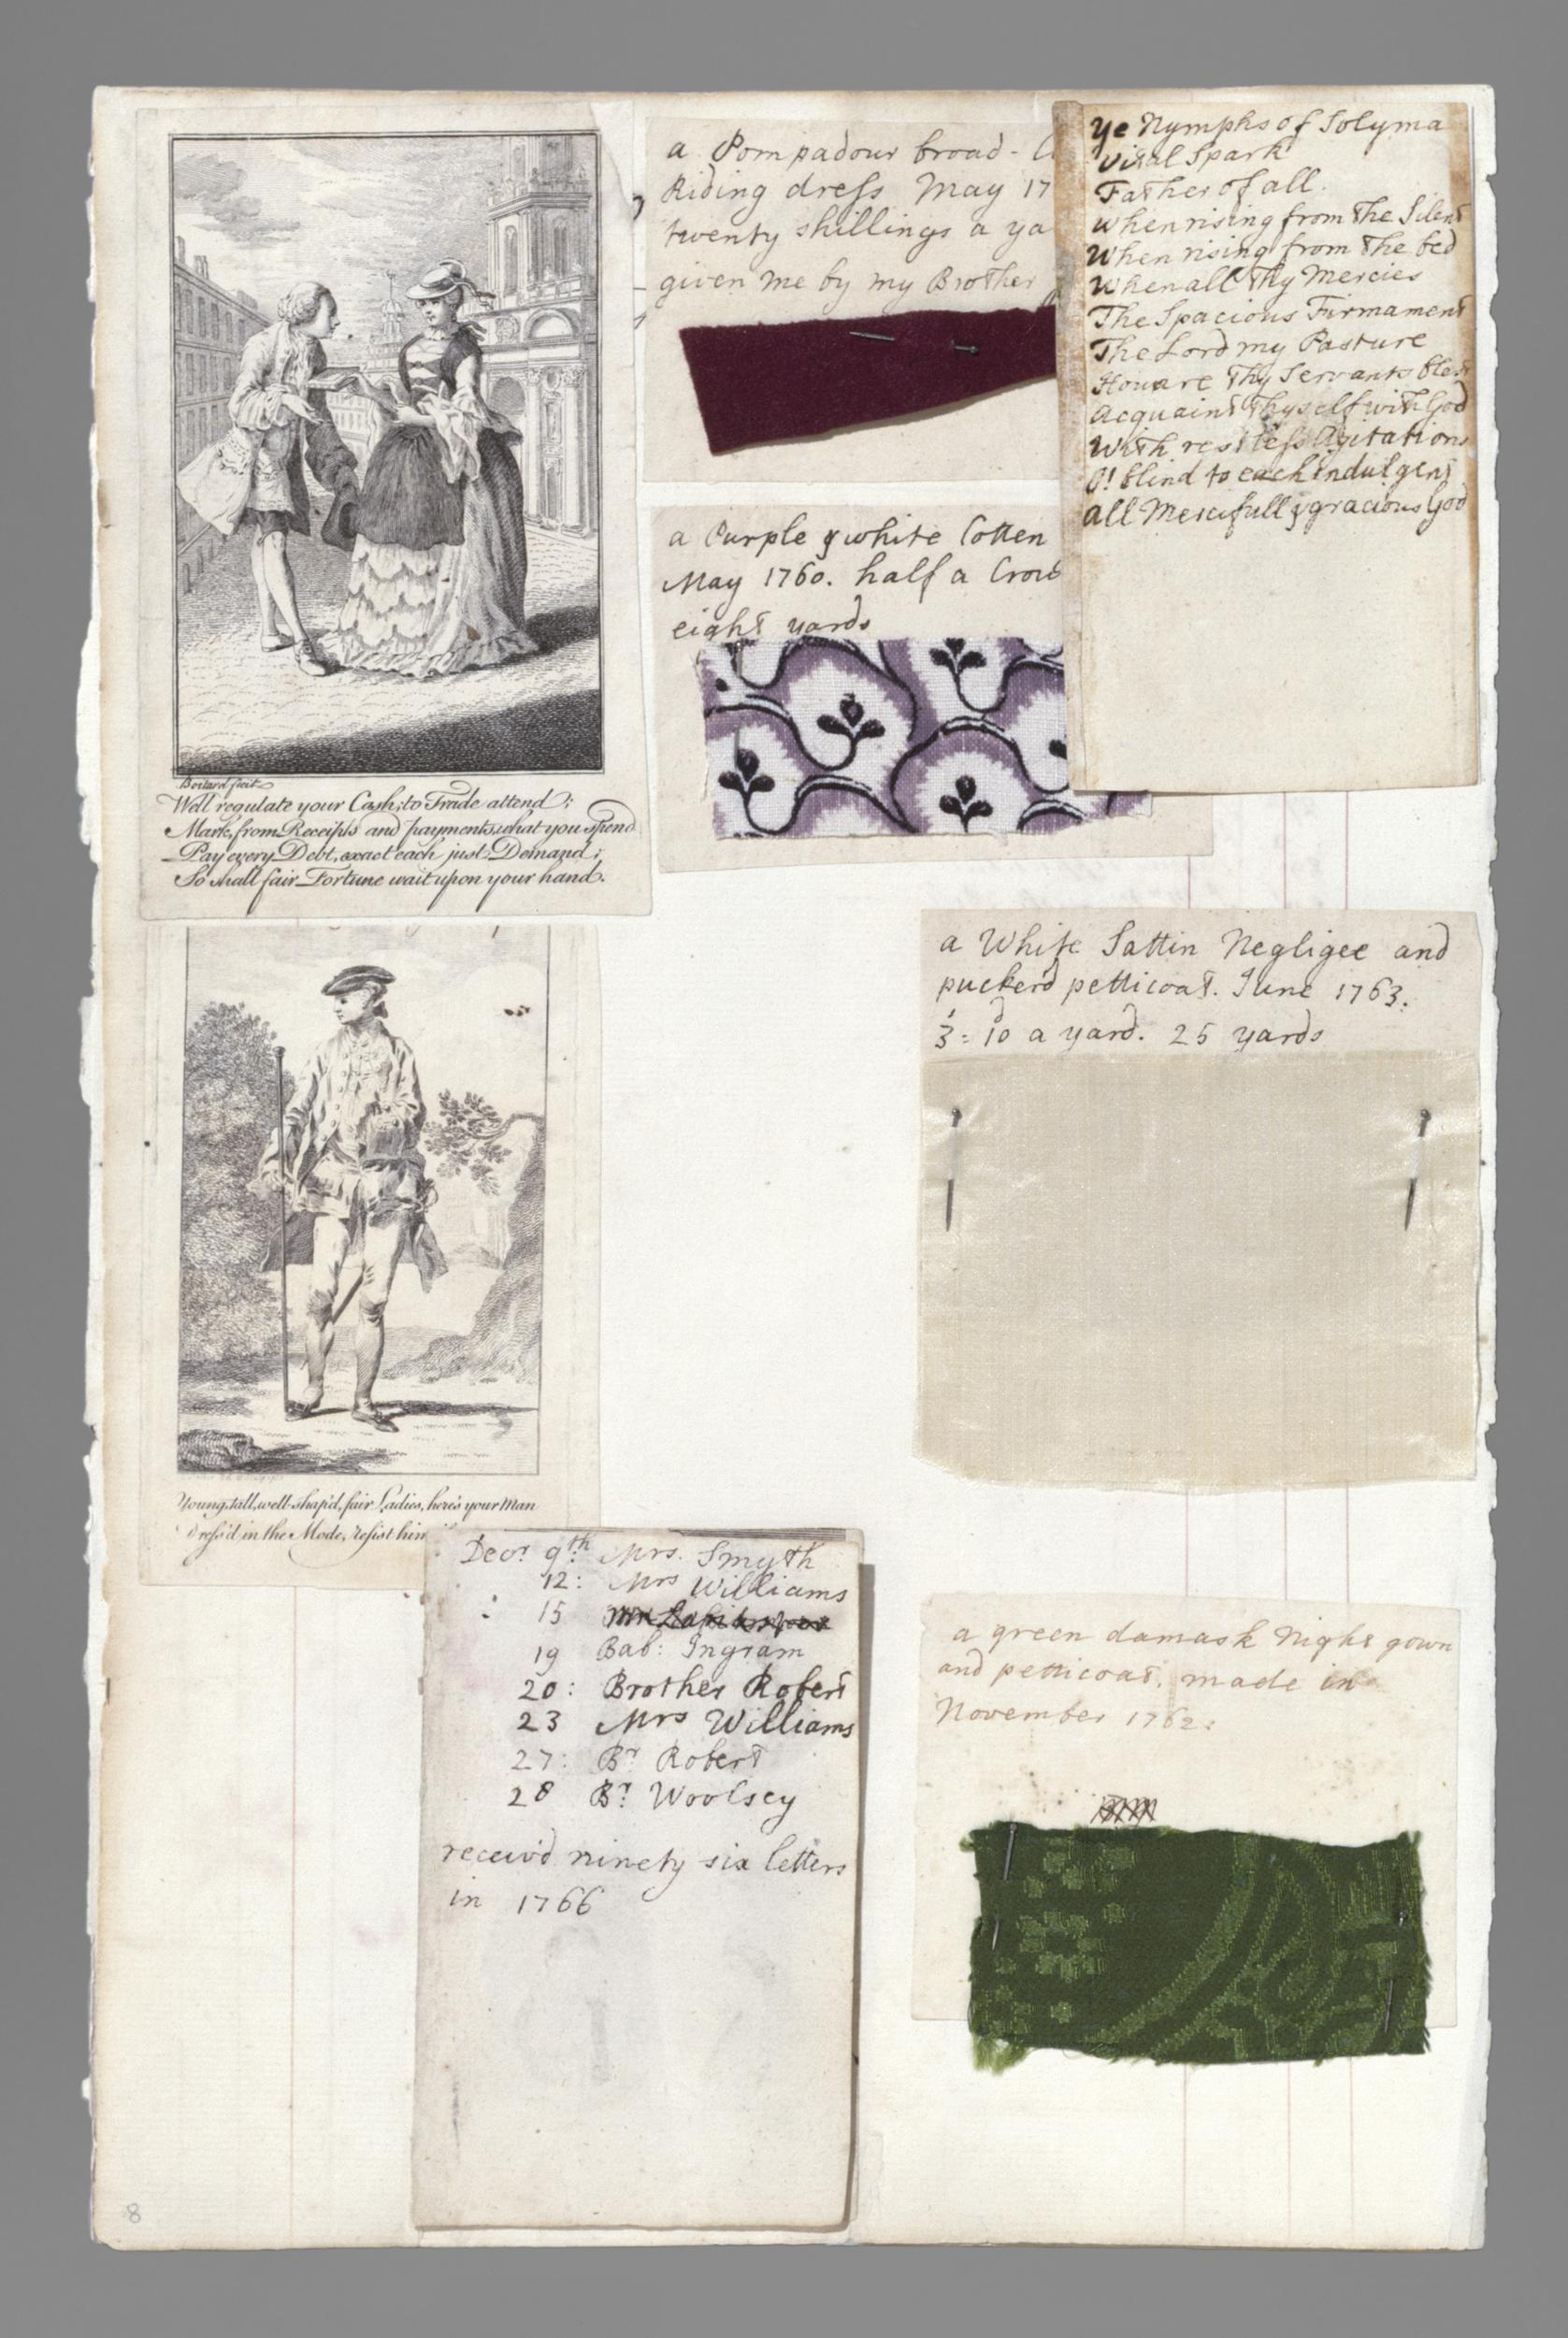 Barbara Johnson Album, England, 1746-1823, Paper, parchment, textiles, Victoria & Albert T.219-1973